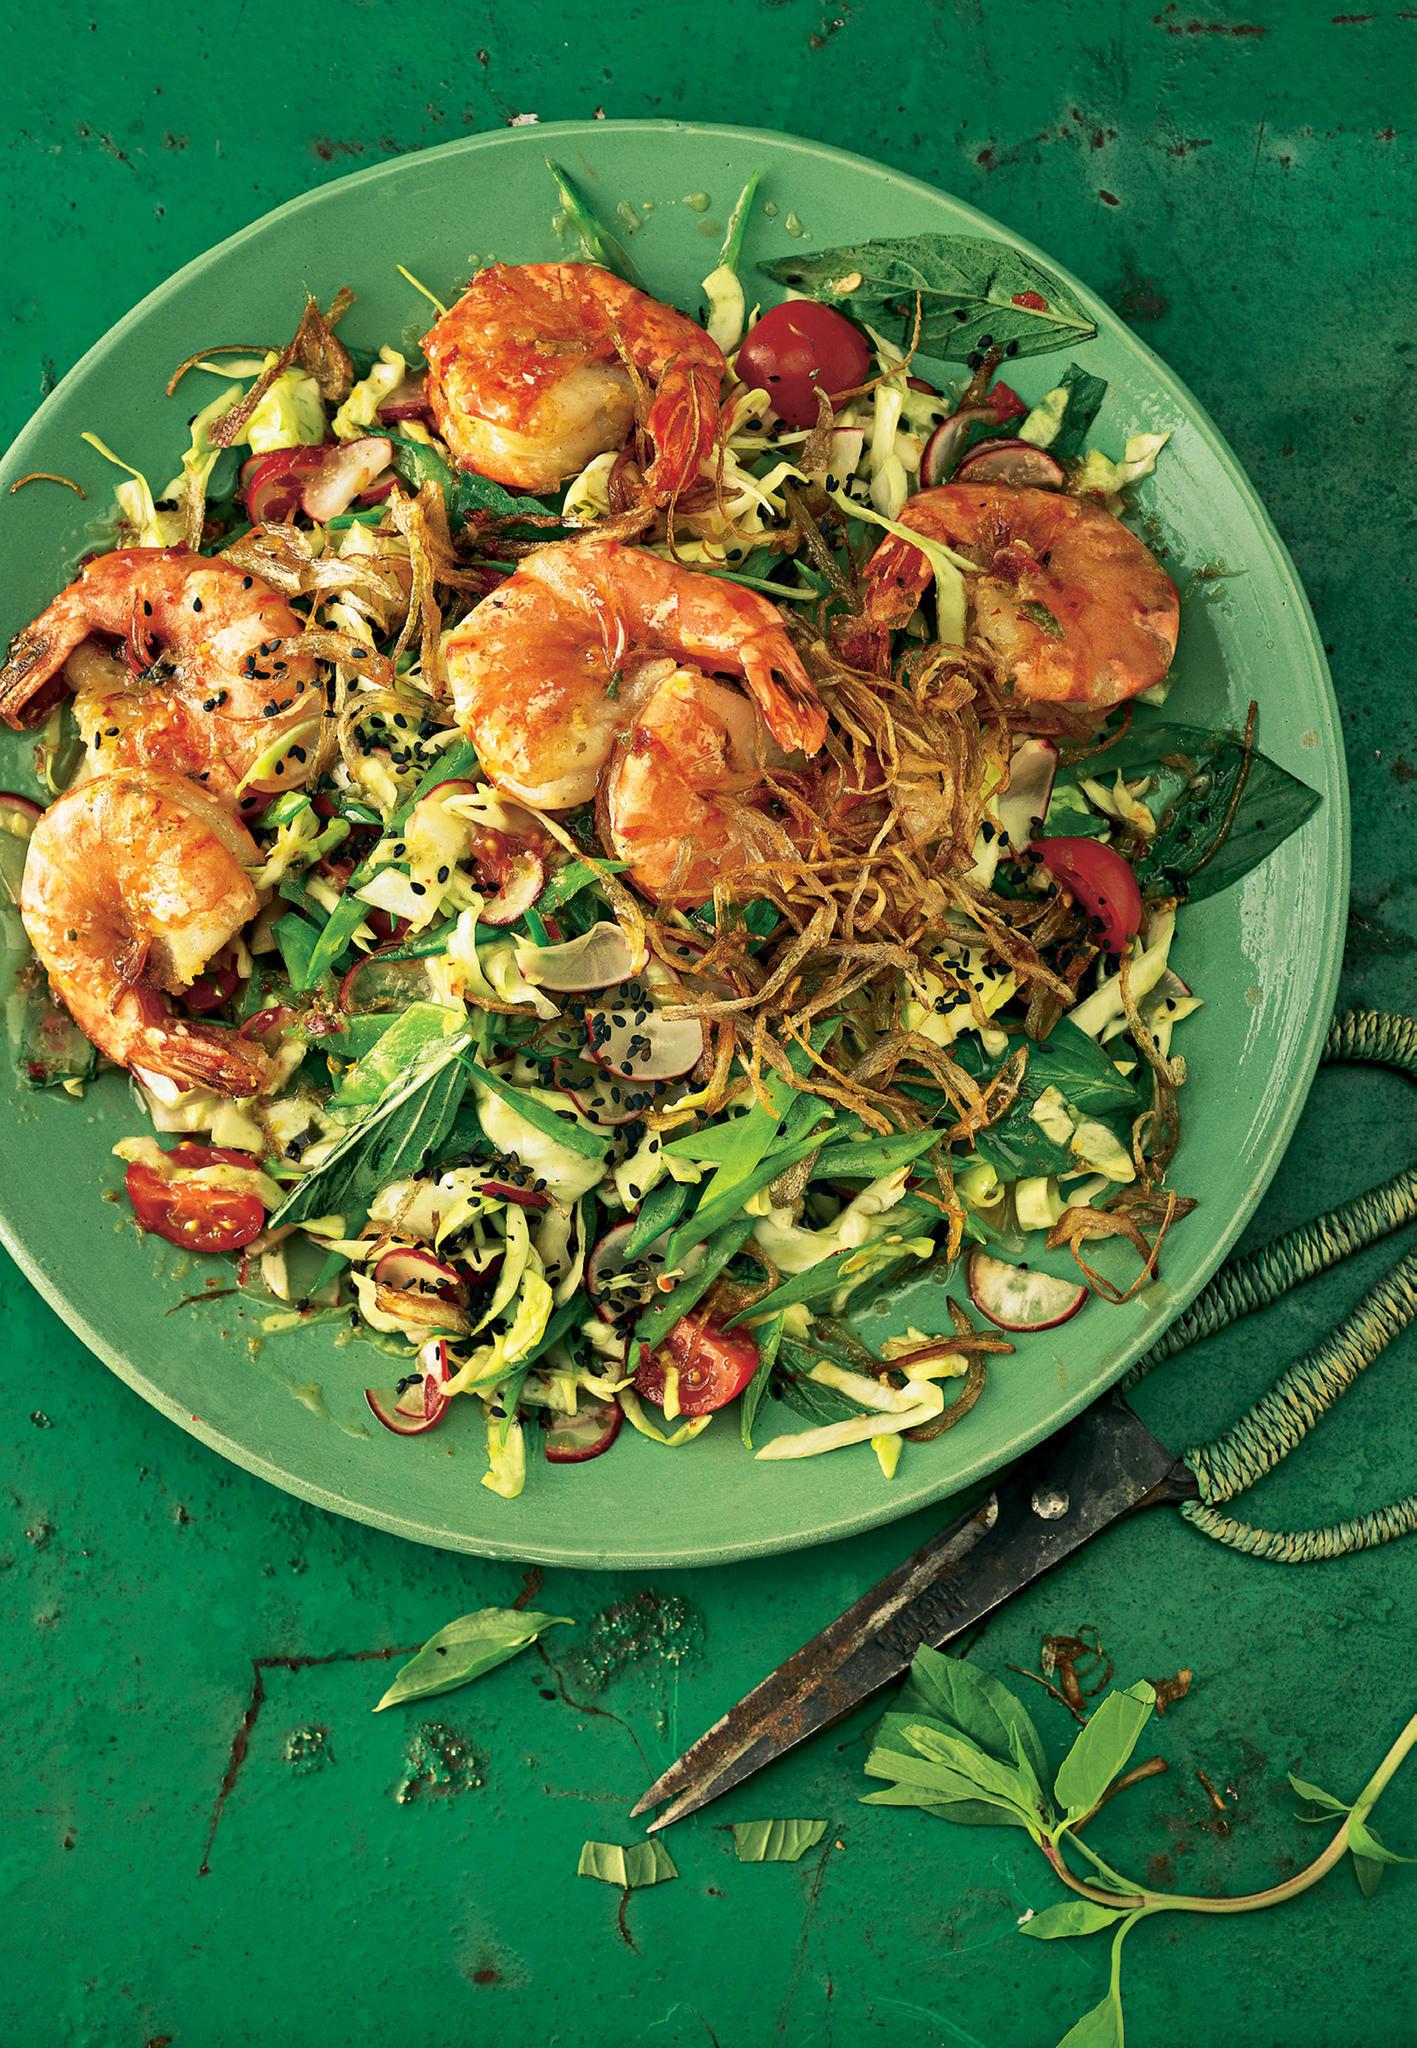 Thai Küche Rezepte Schnell | Hähnchen Curry Rezept Thomas Sixt